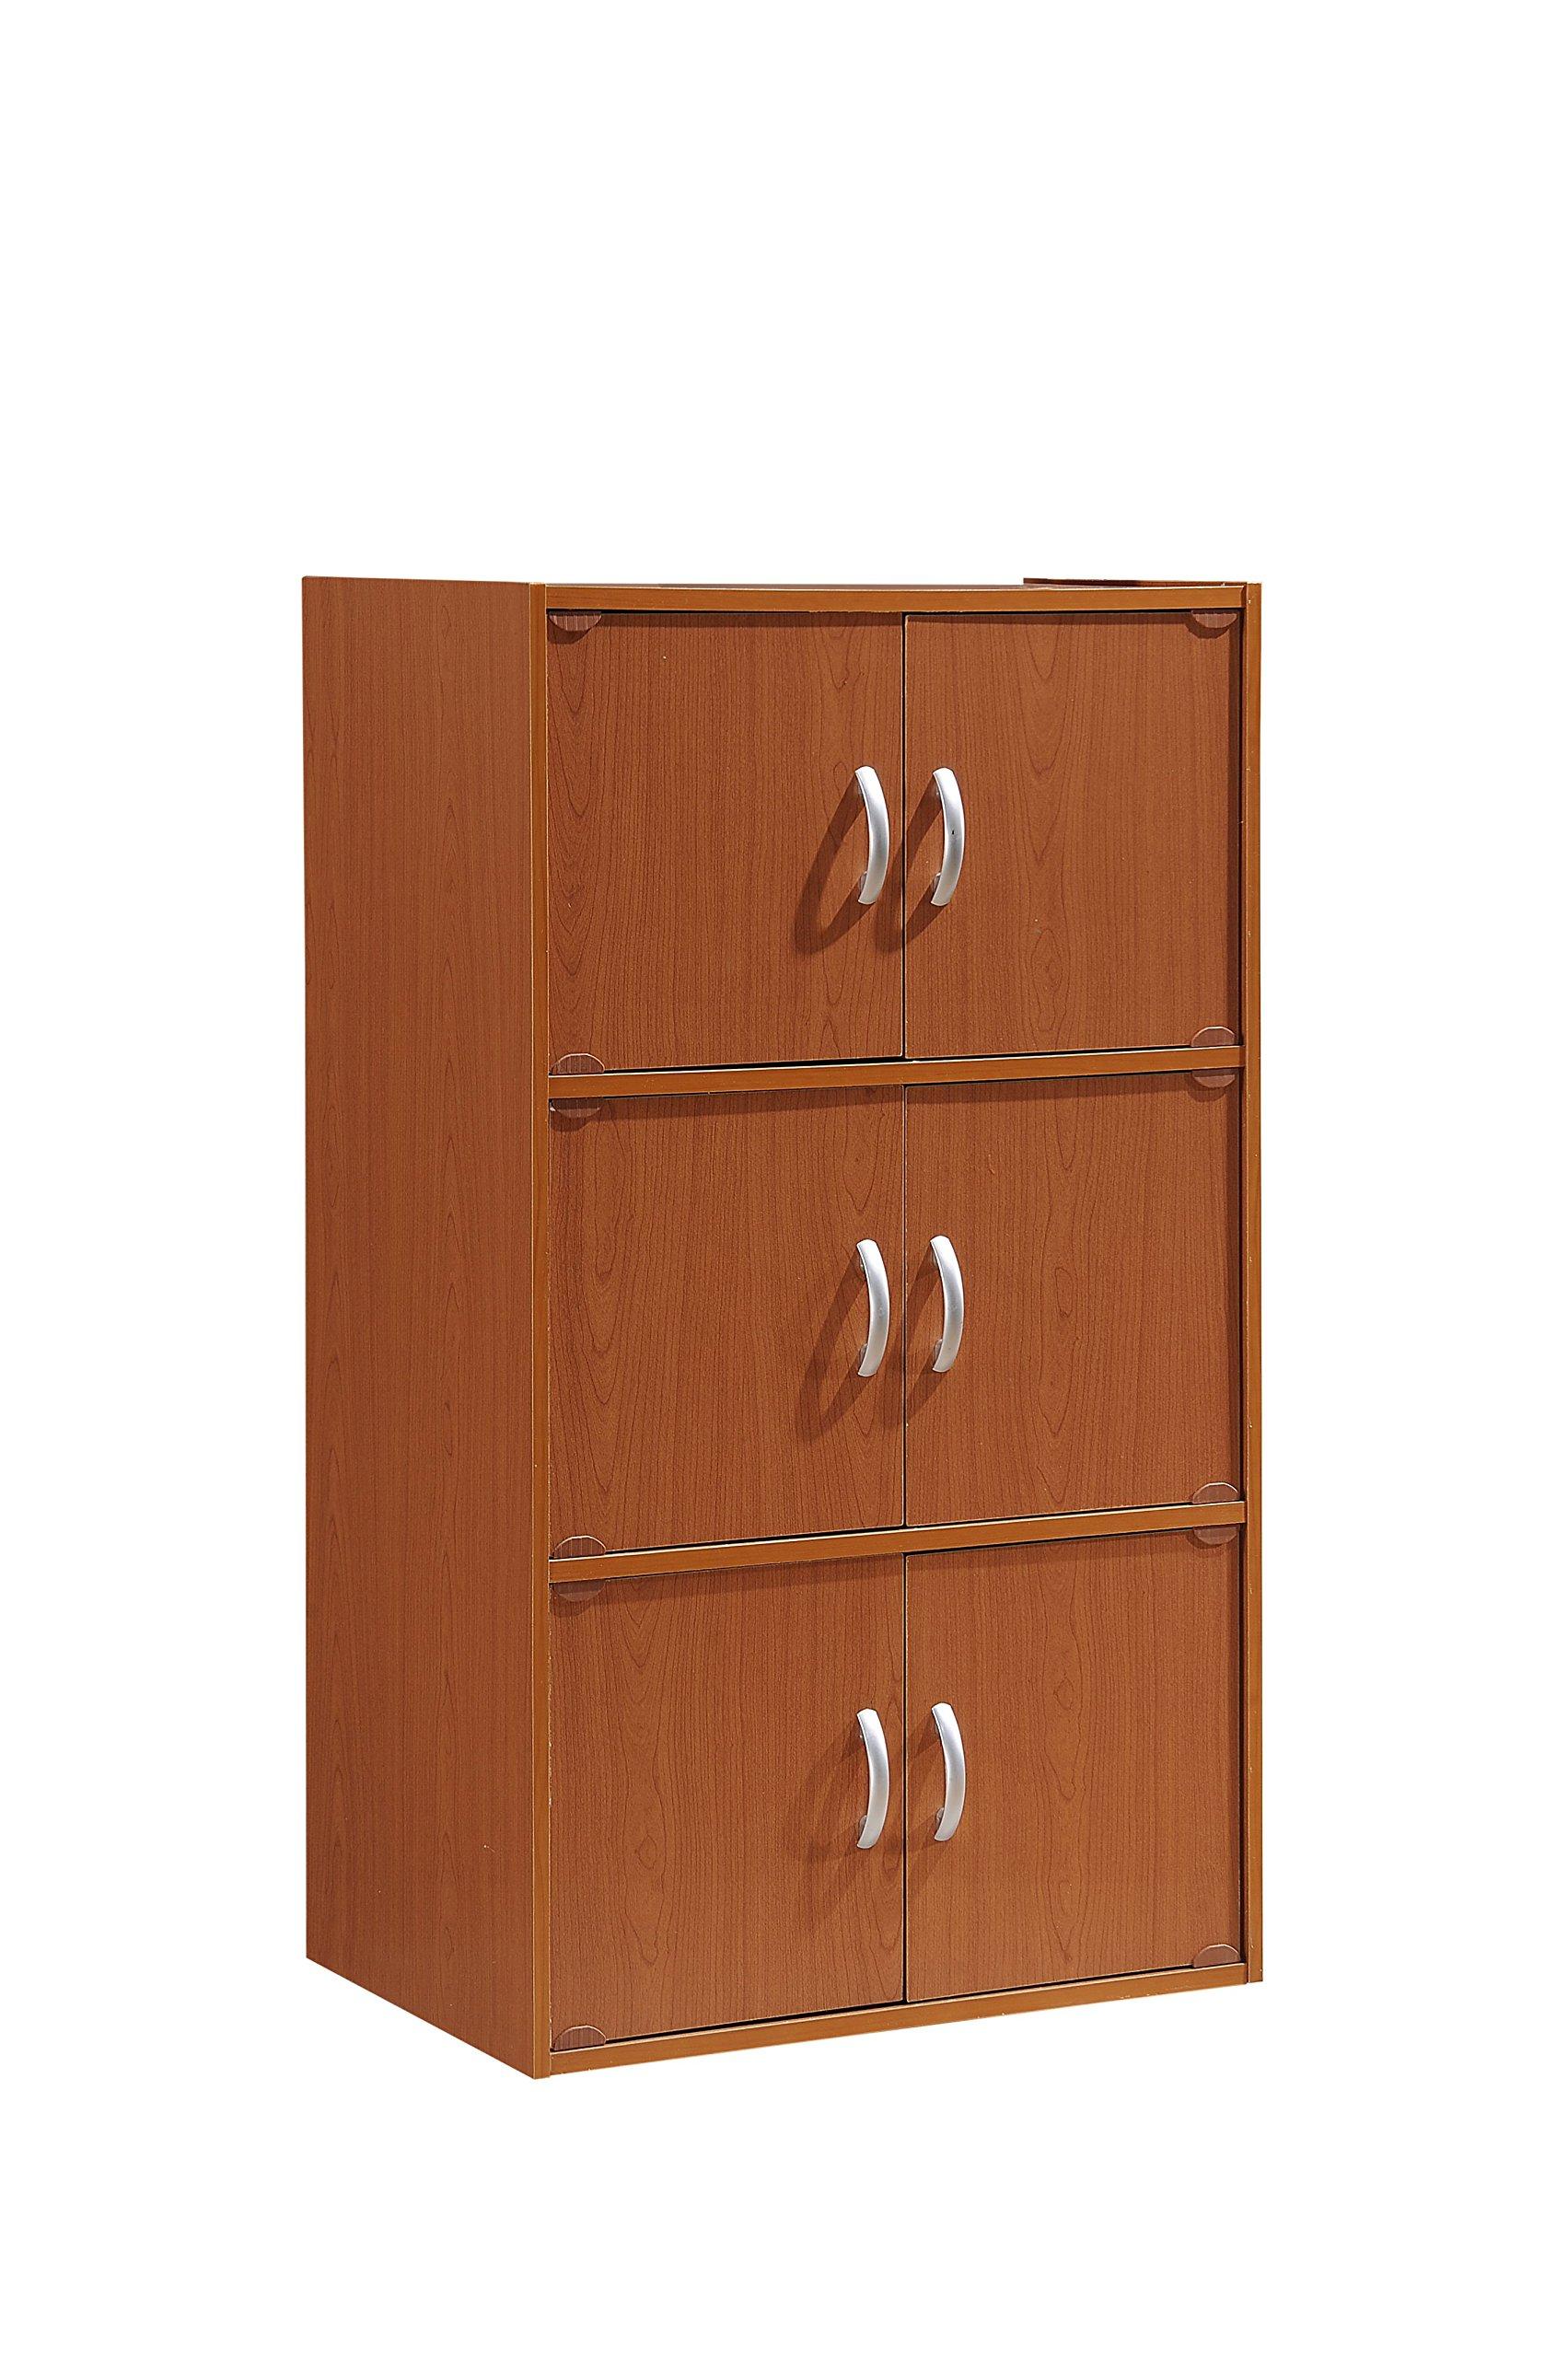 Hodedah 6 Door, Three Shleves, Enclosed Storage Cabinet, Cherry by HODEDAH IMPORT (Image #1)